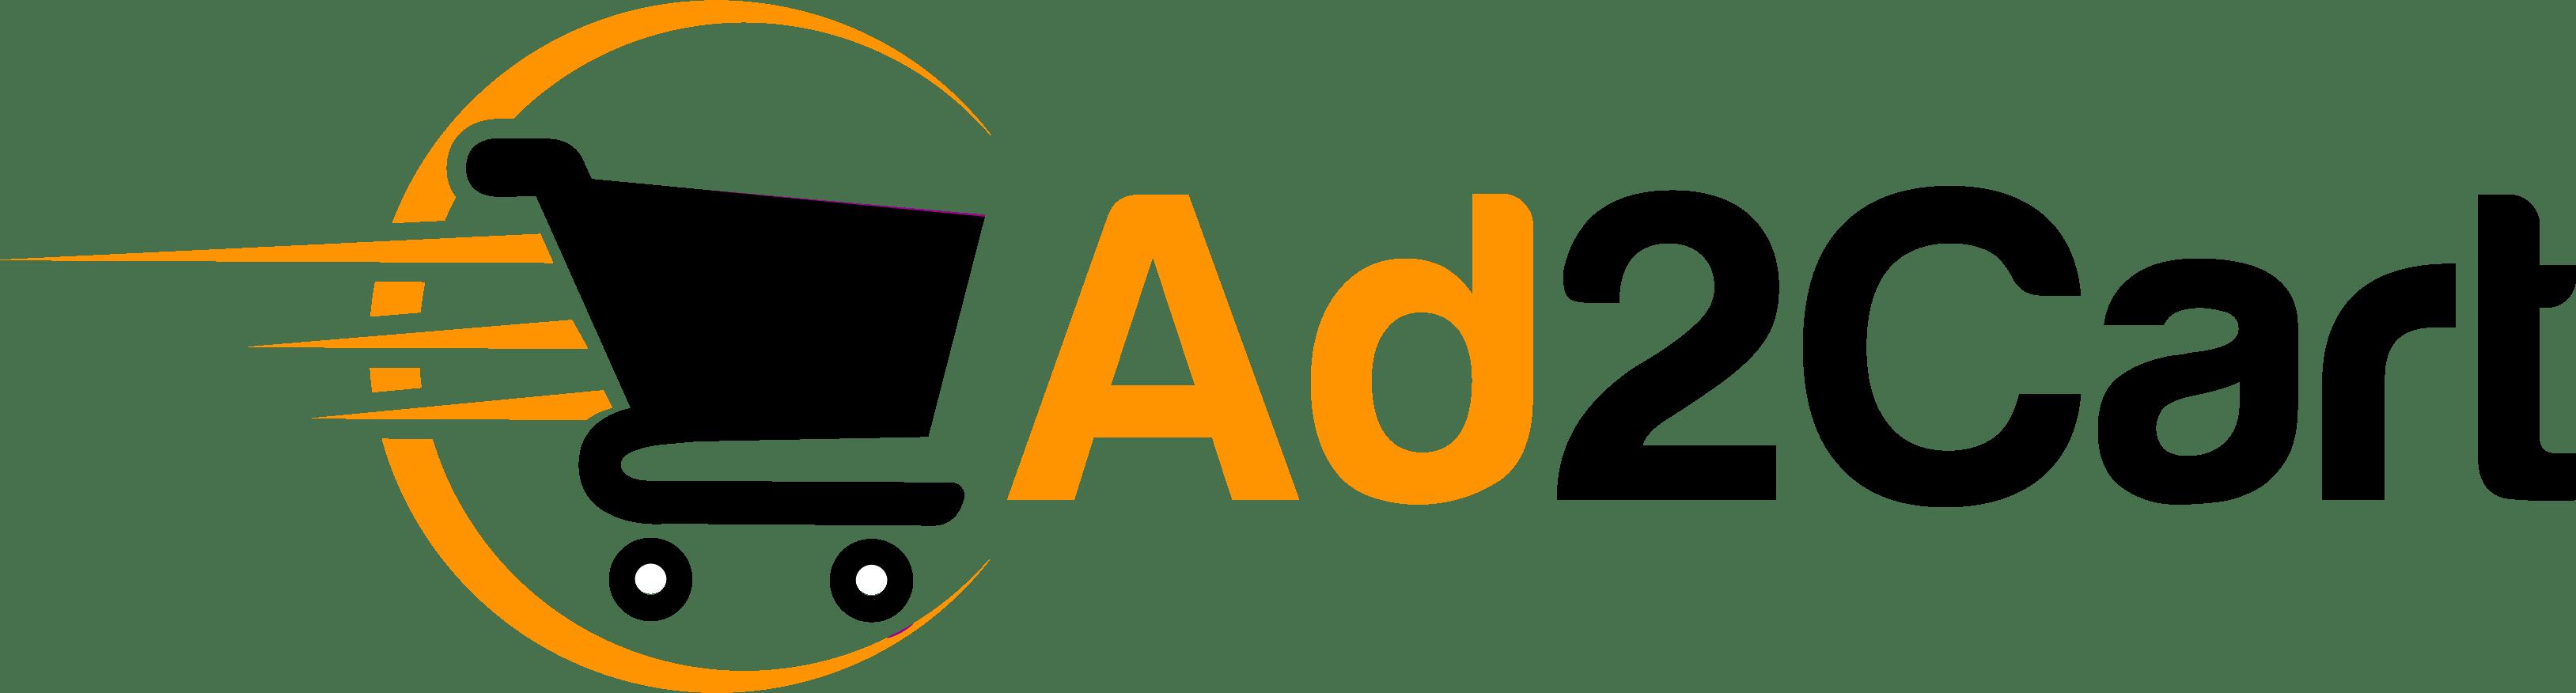 Ad2cart Logo